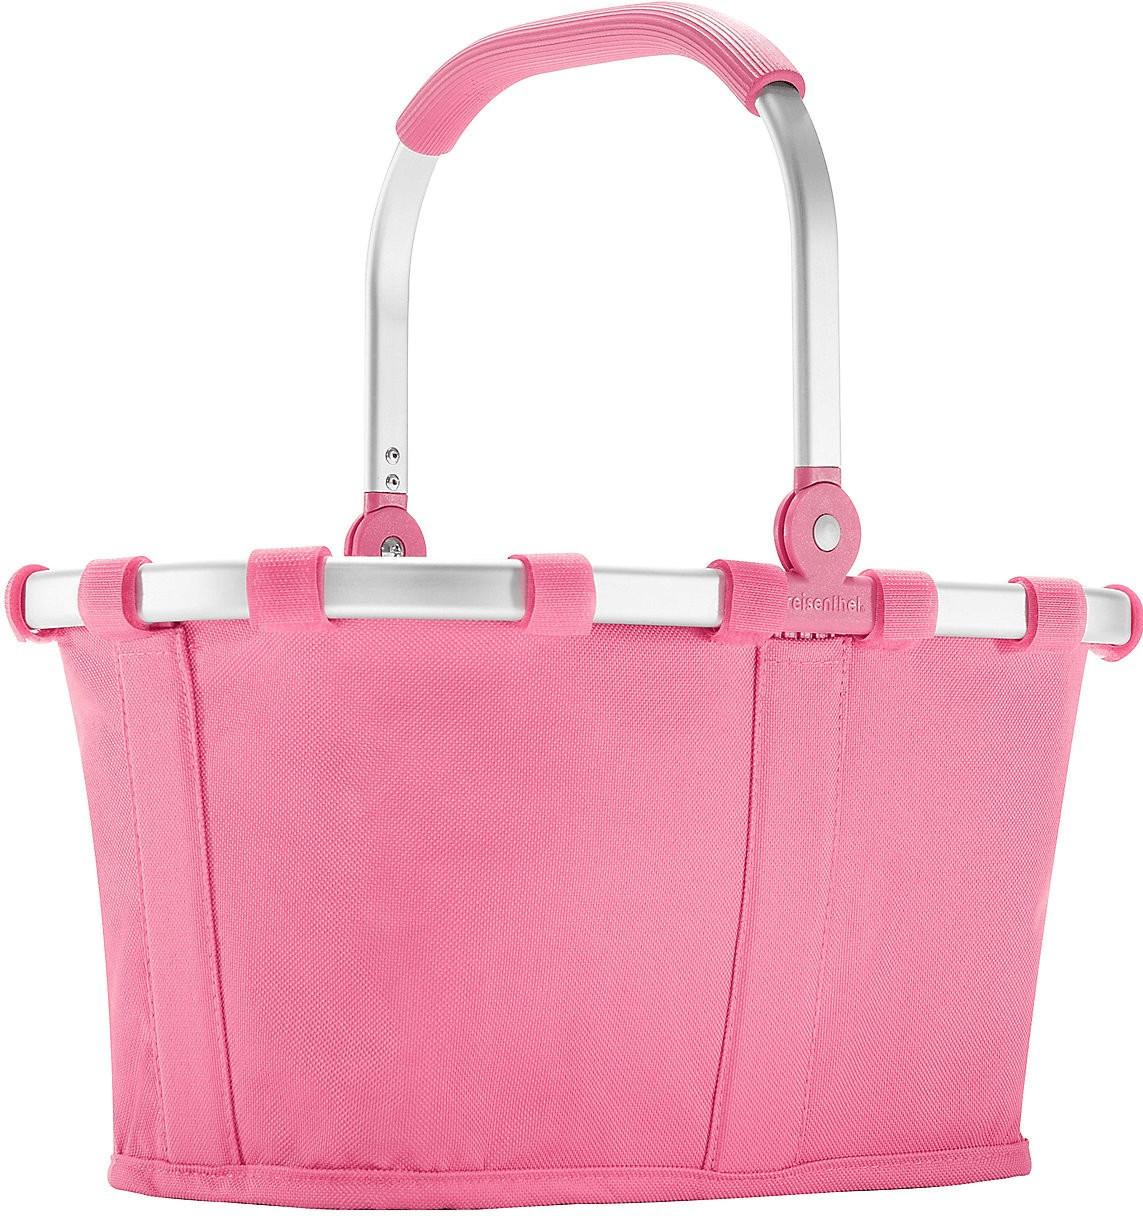 Reisenthel Carrybag XS pink